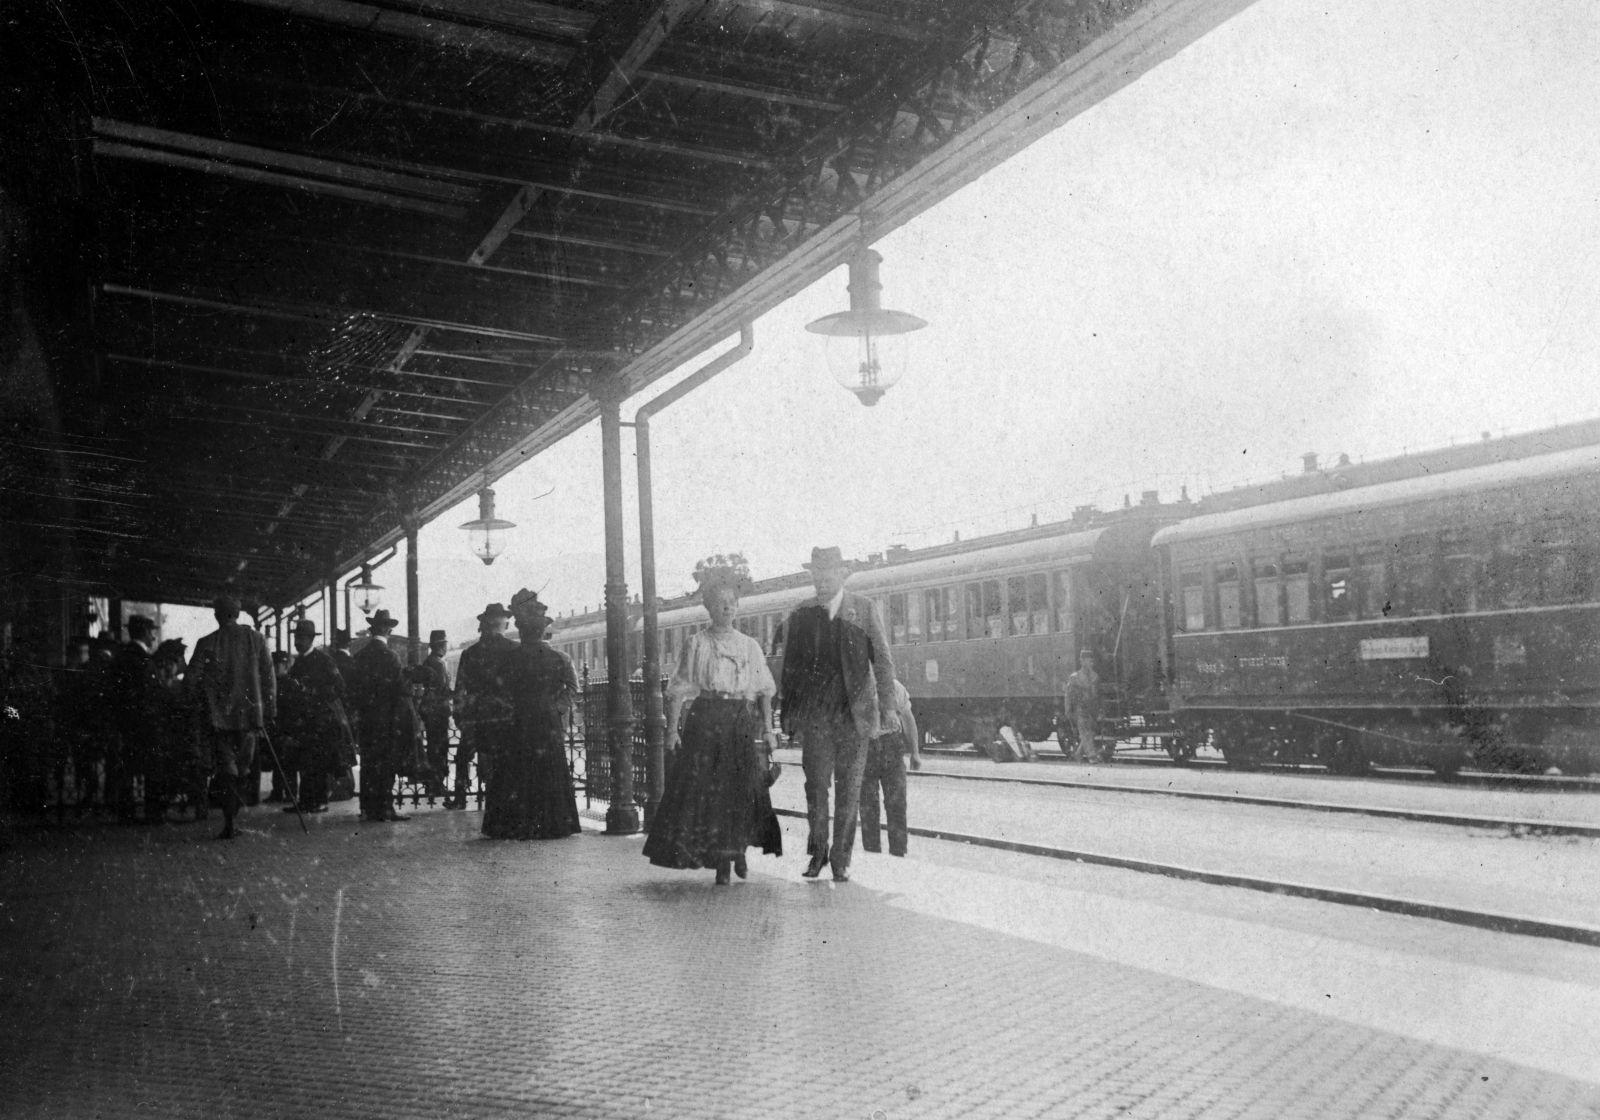 A brassói pályaudvar 1918-ban | Forrás: Fortepan